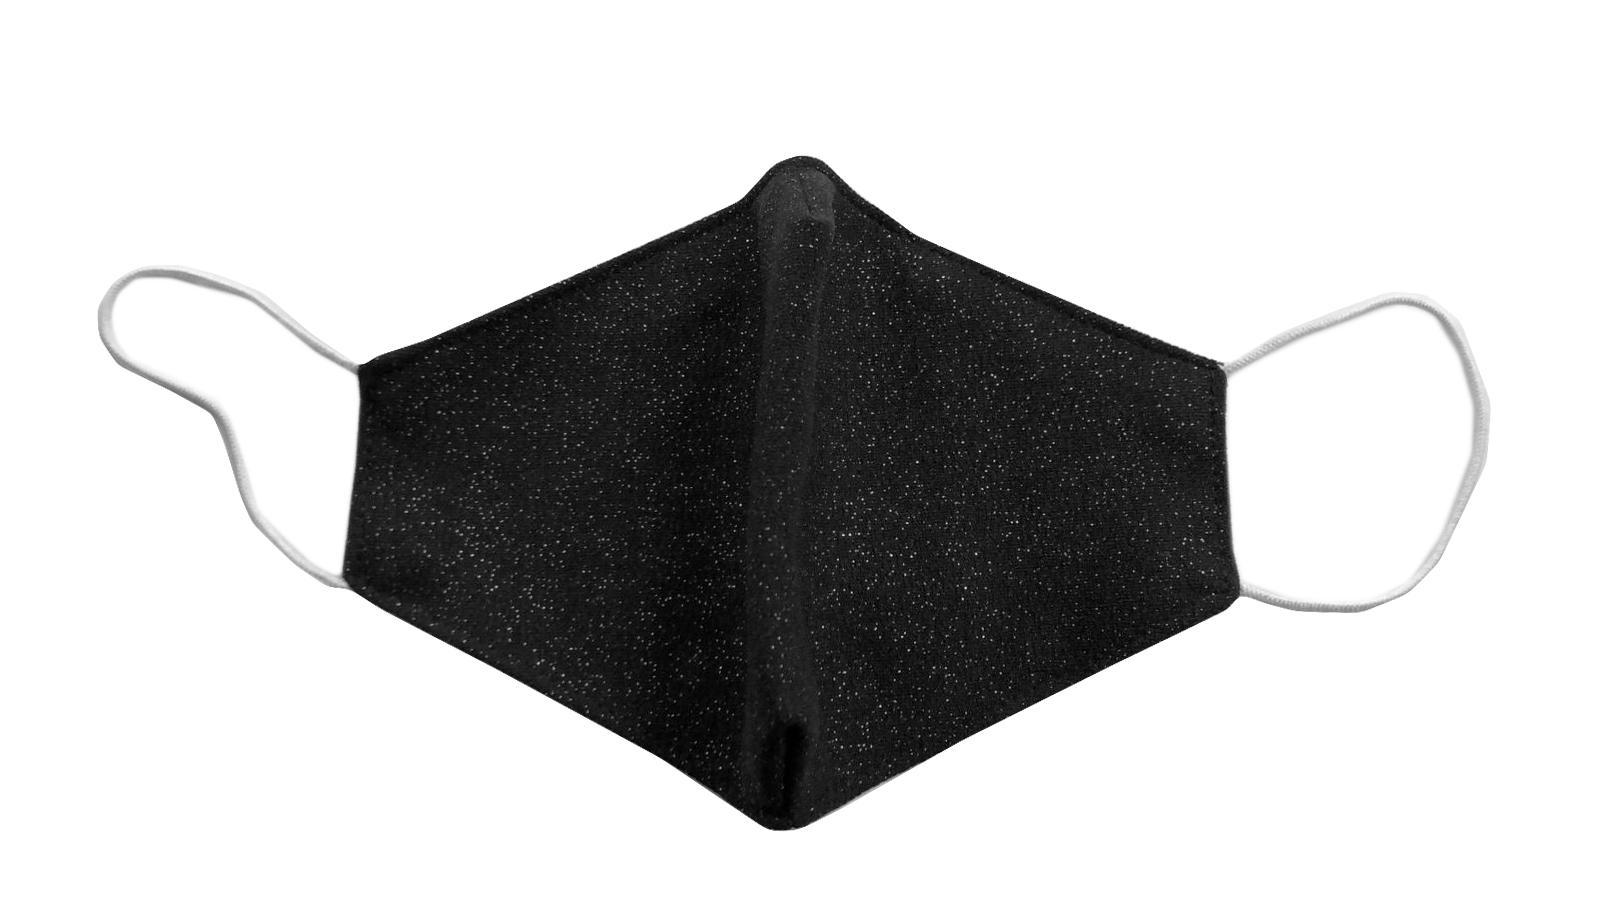 Black Silver Print Face Mask With Filter Pocket